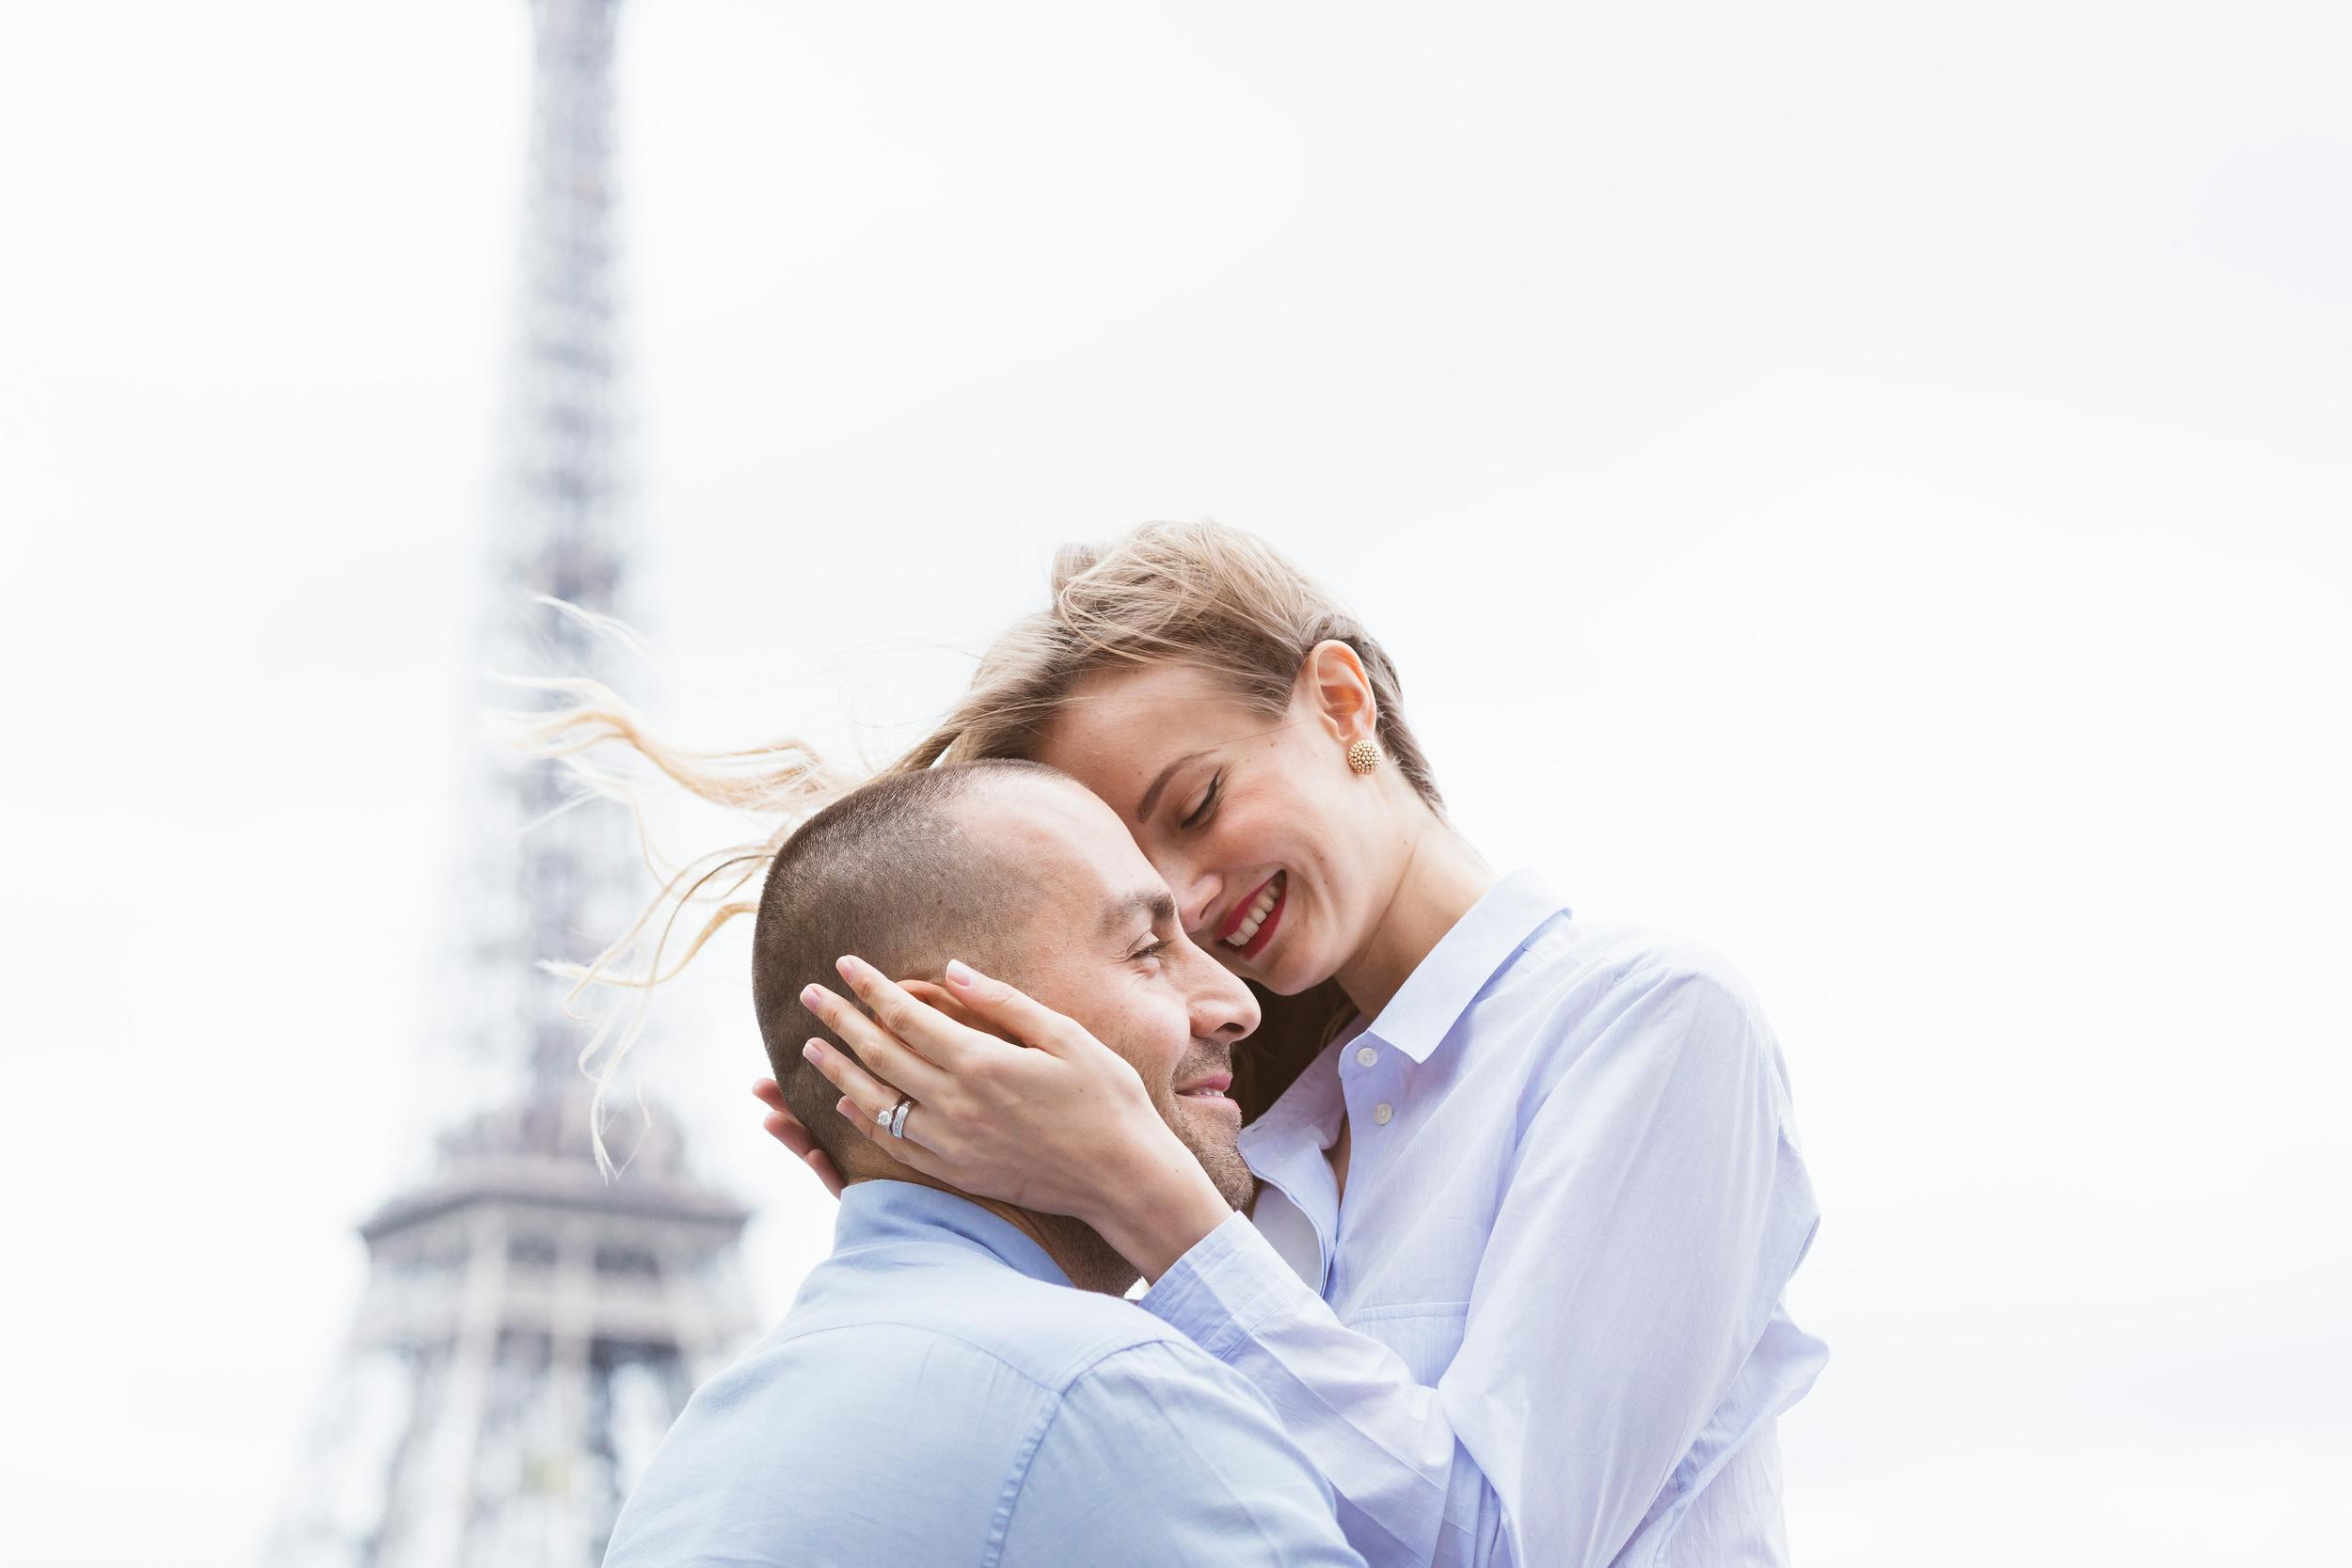 romantic couple portrait at bir hakeim bridge with view of eiffel tower captured by paris photographer federico guendel